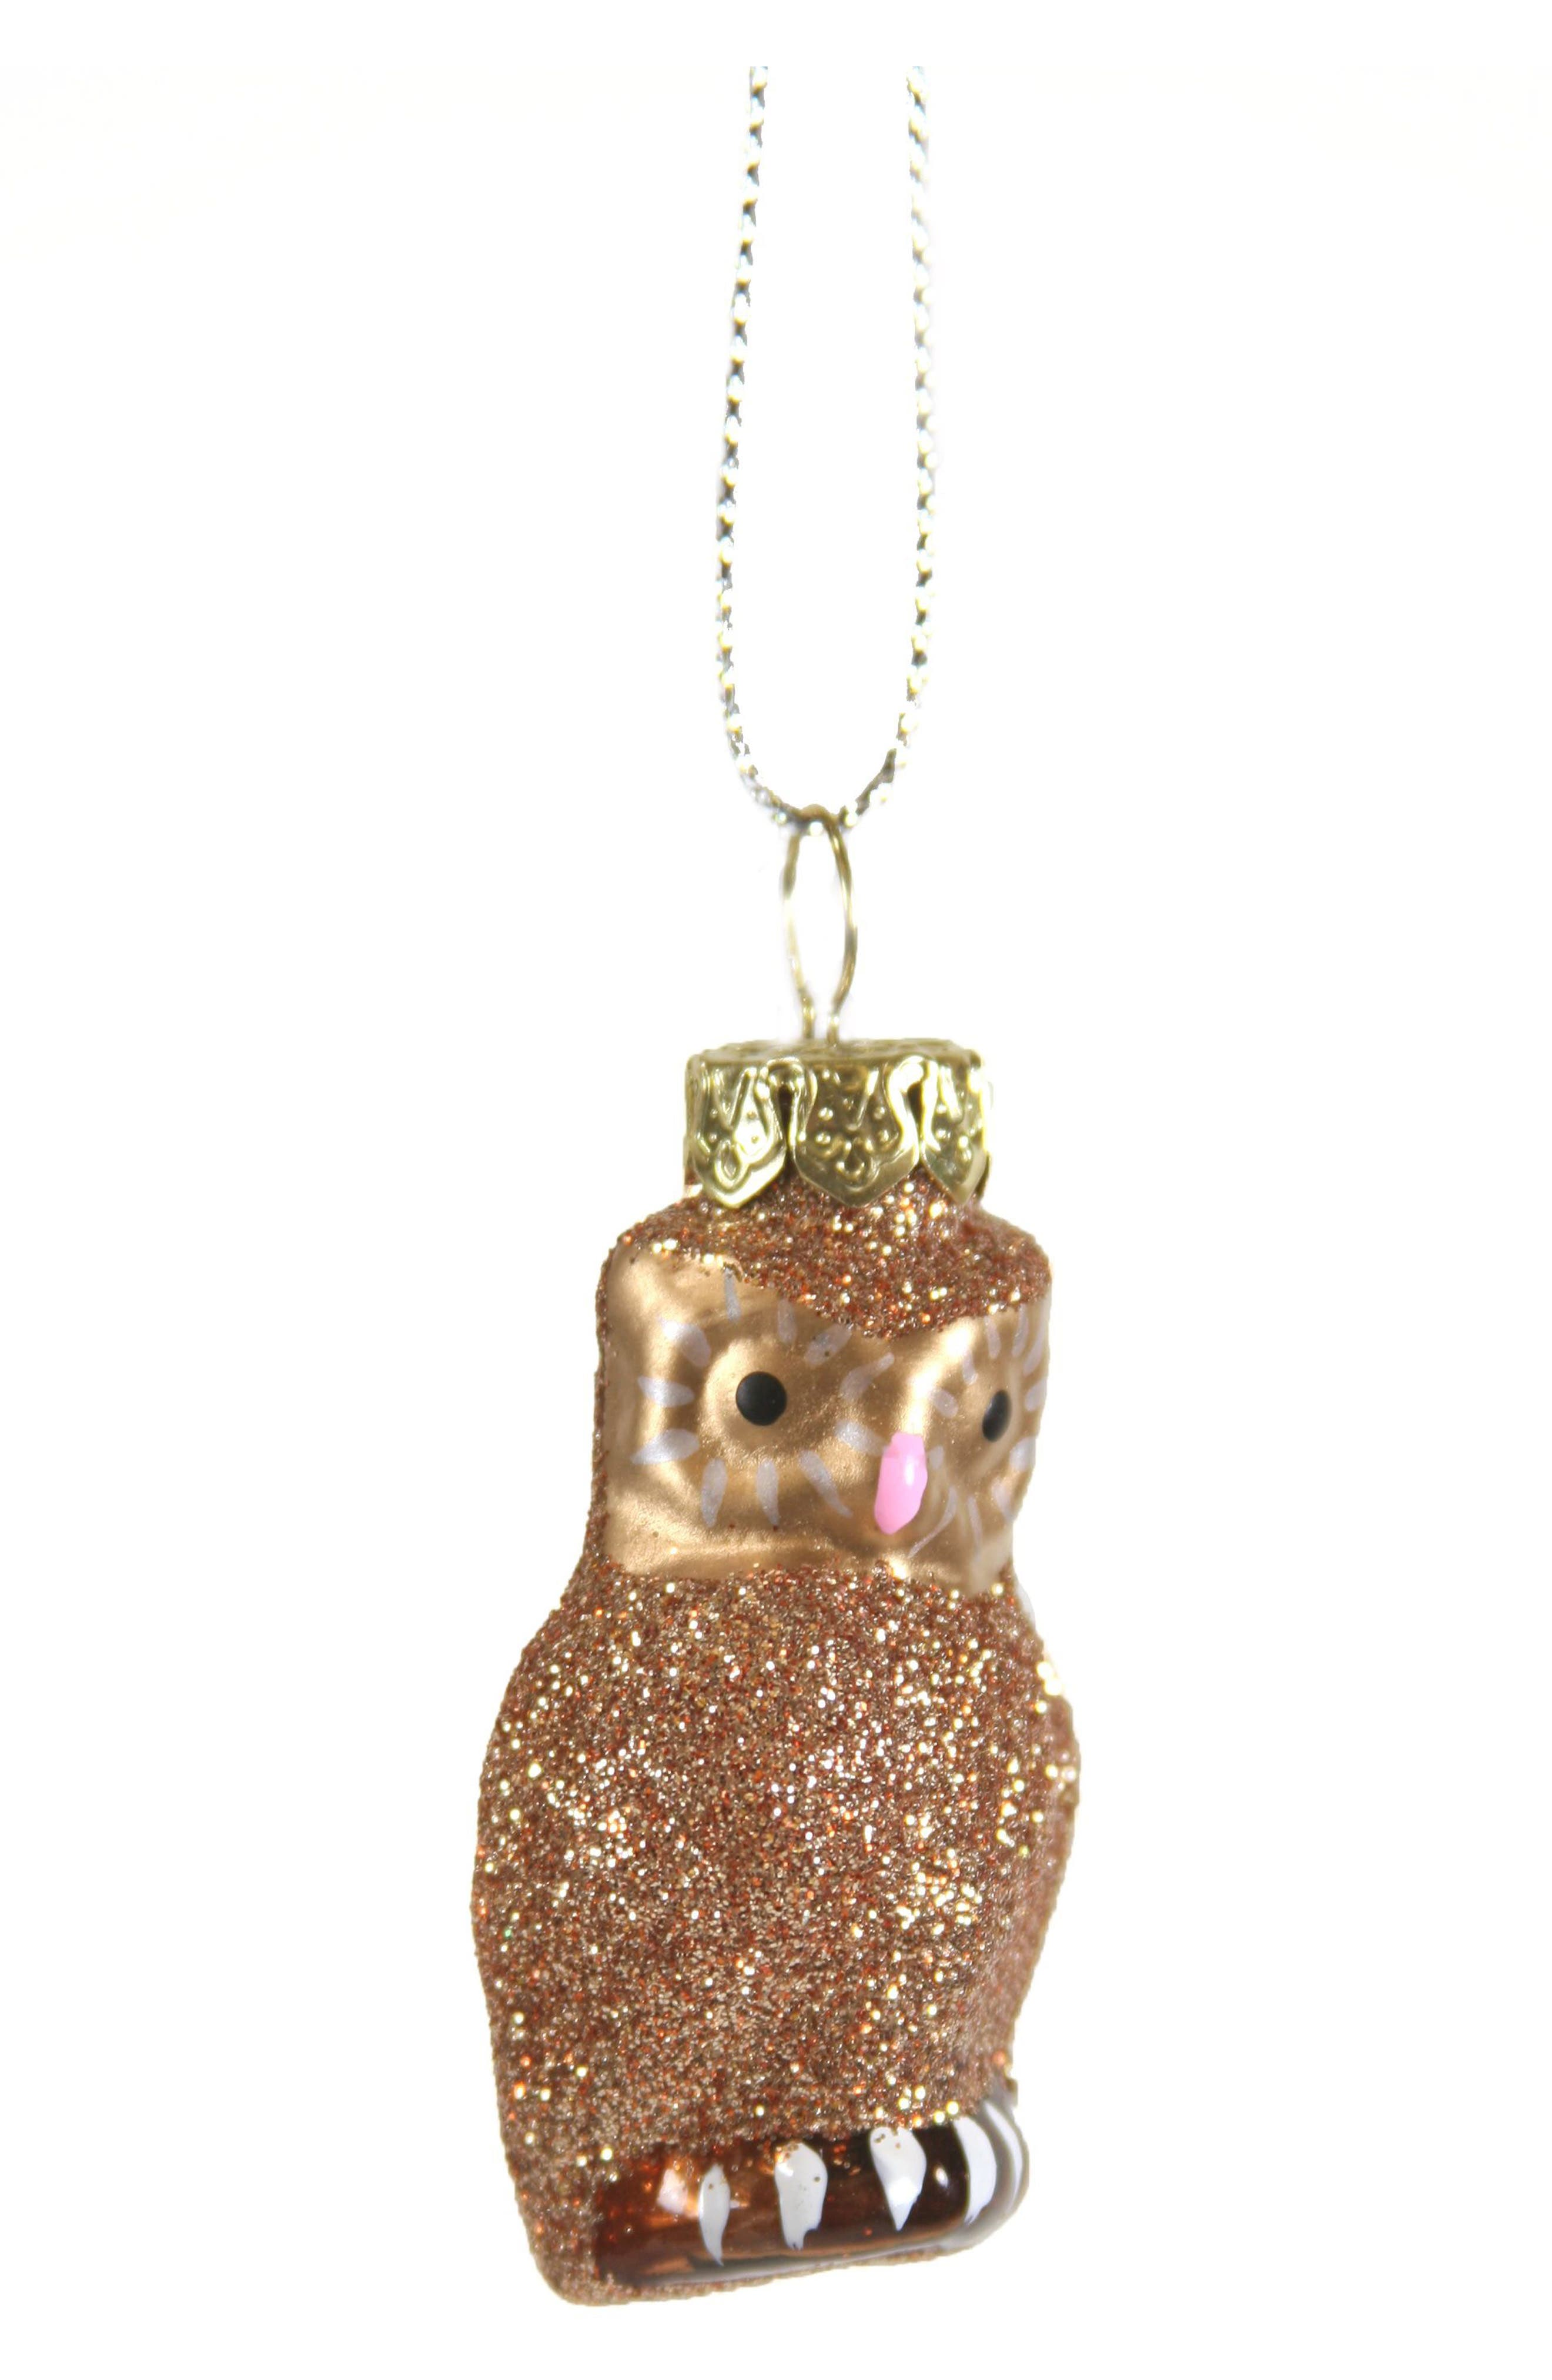 Cody Foster Tiniest Owl Glass Ornament